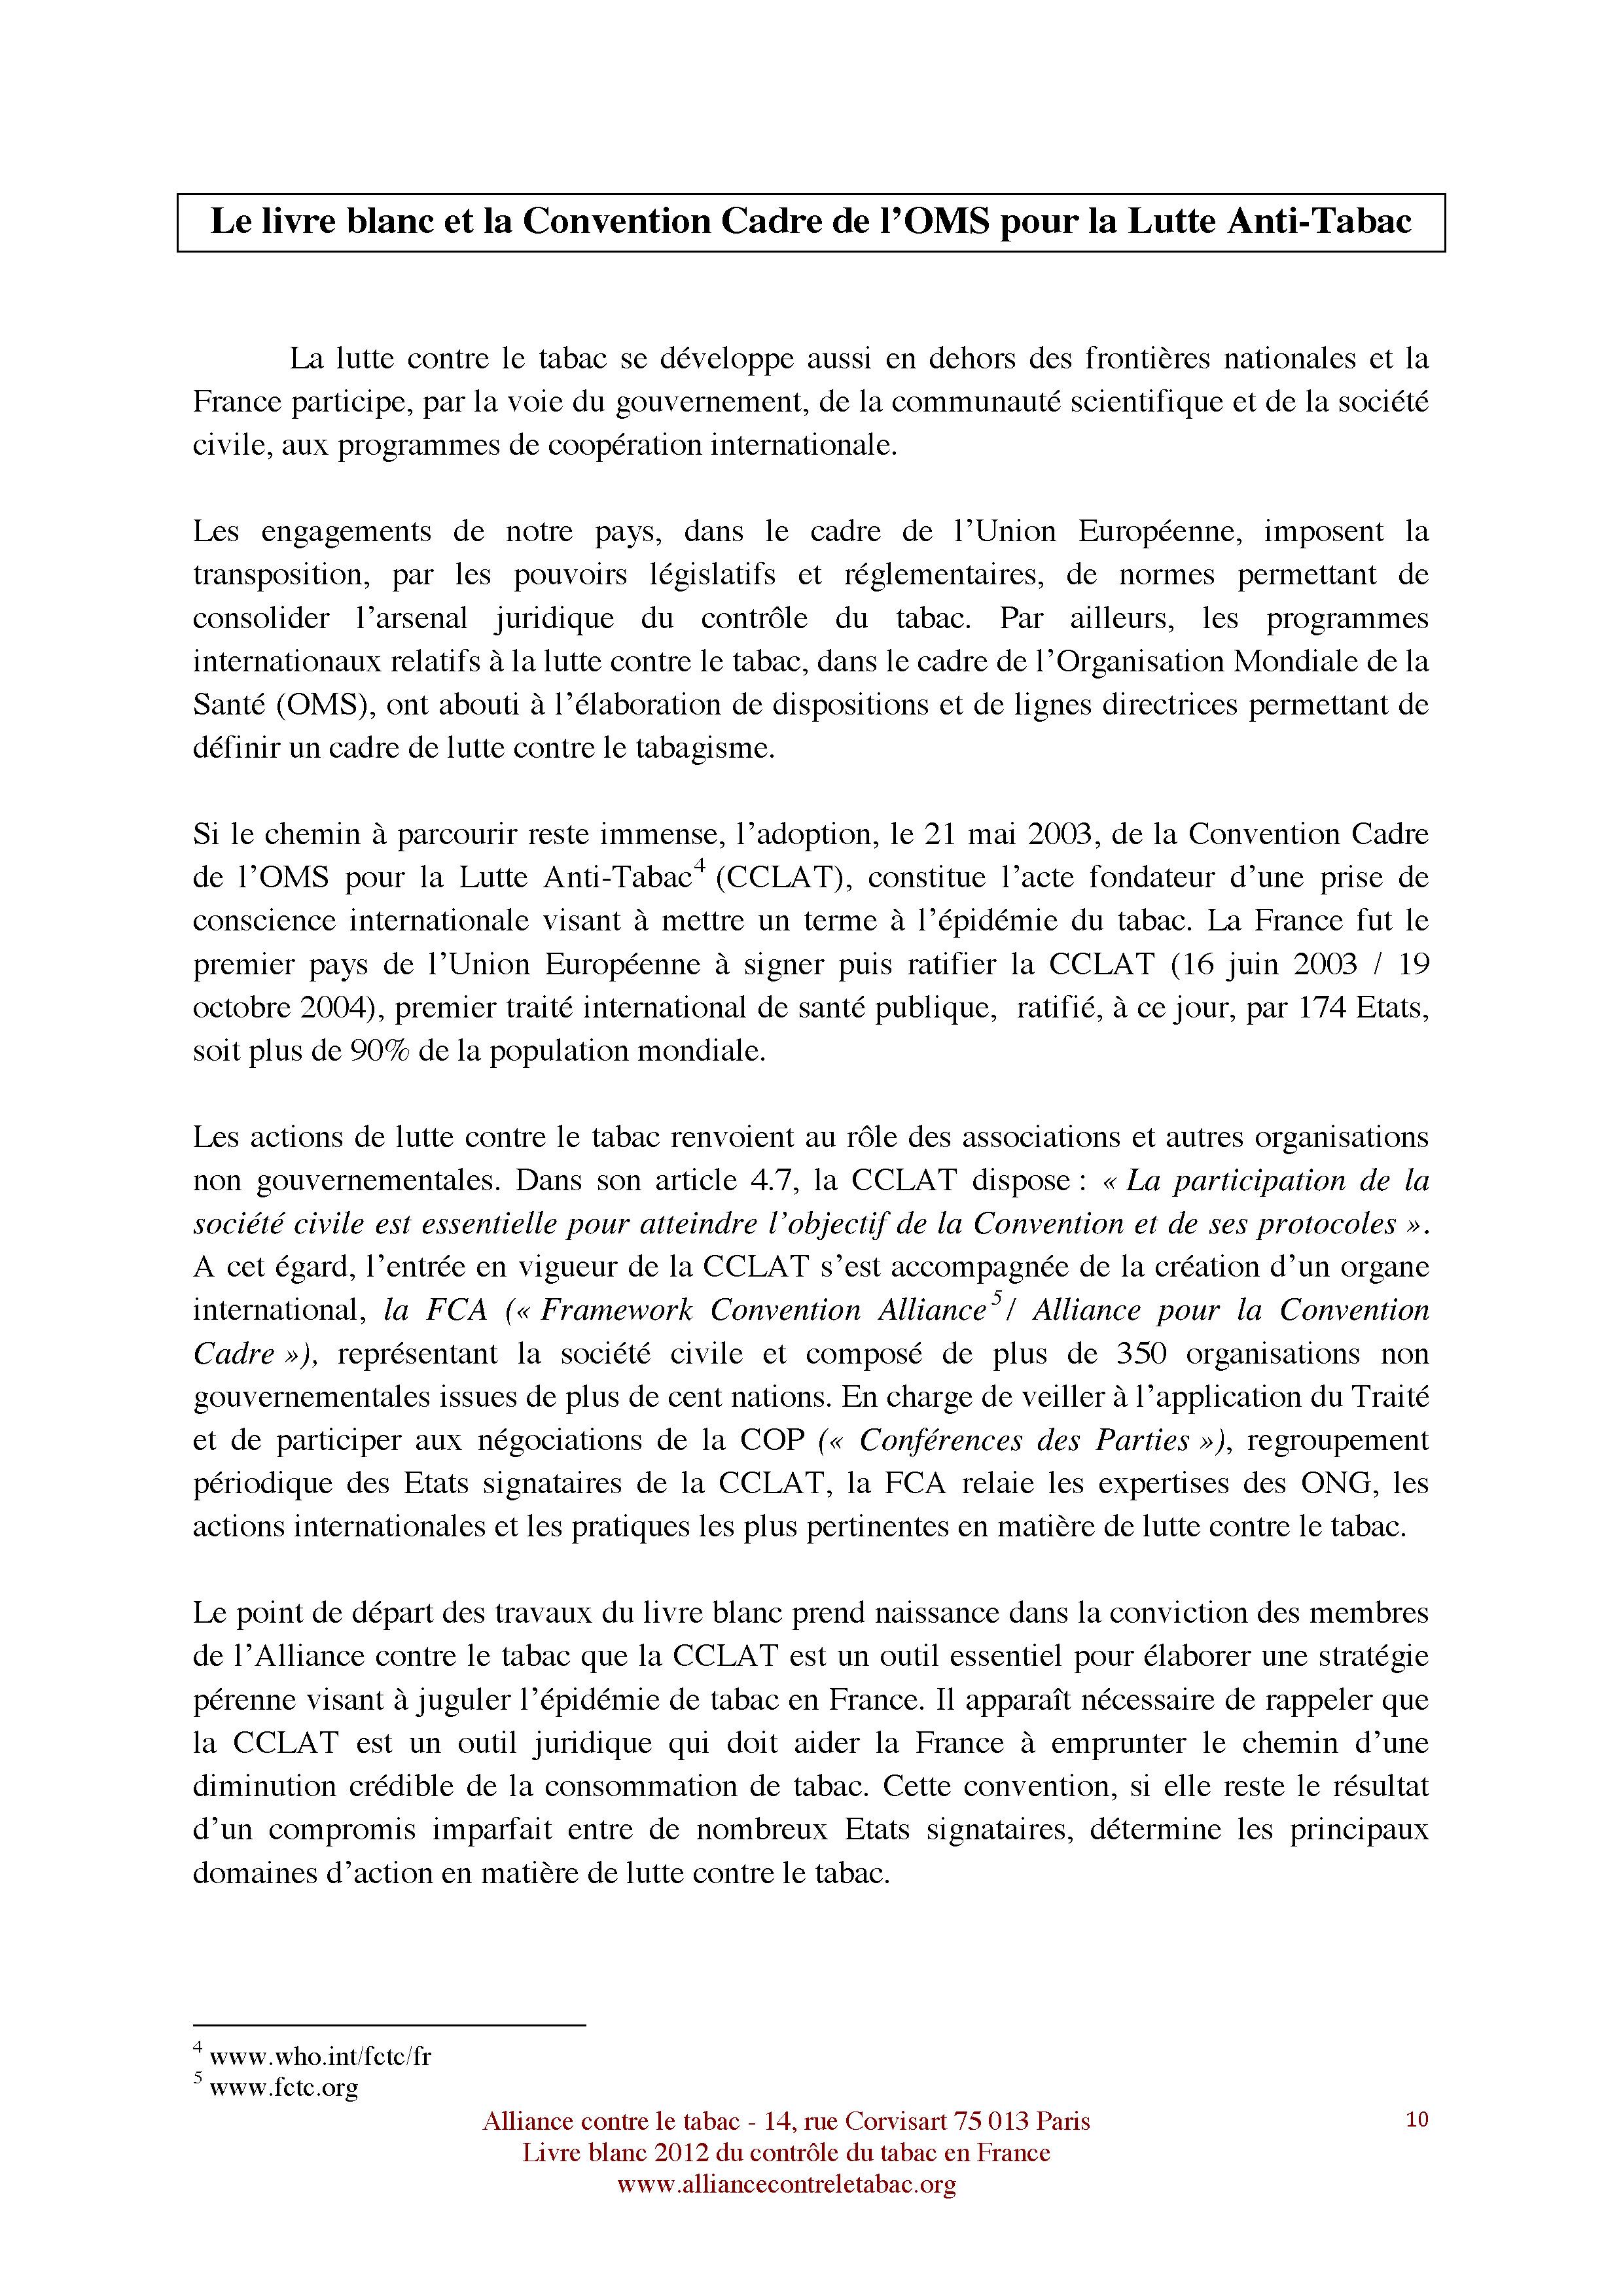 Alliance-dossier-presse_livre-blanc-22mars2012_Page_10.jpg